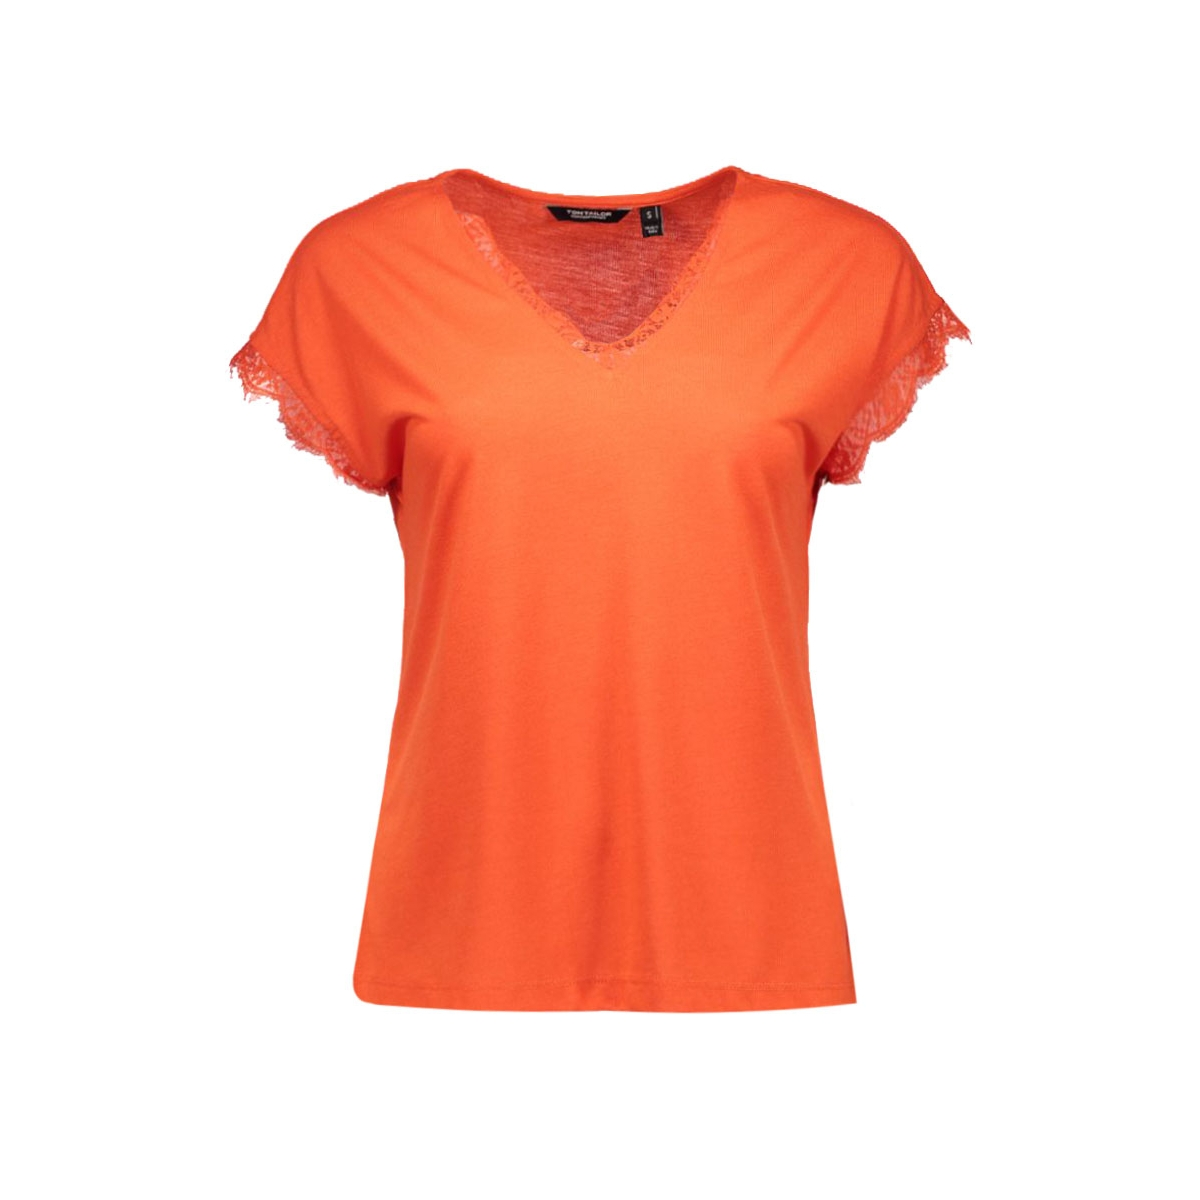 1035220.00.75 tom tailor t-shirt 3545